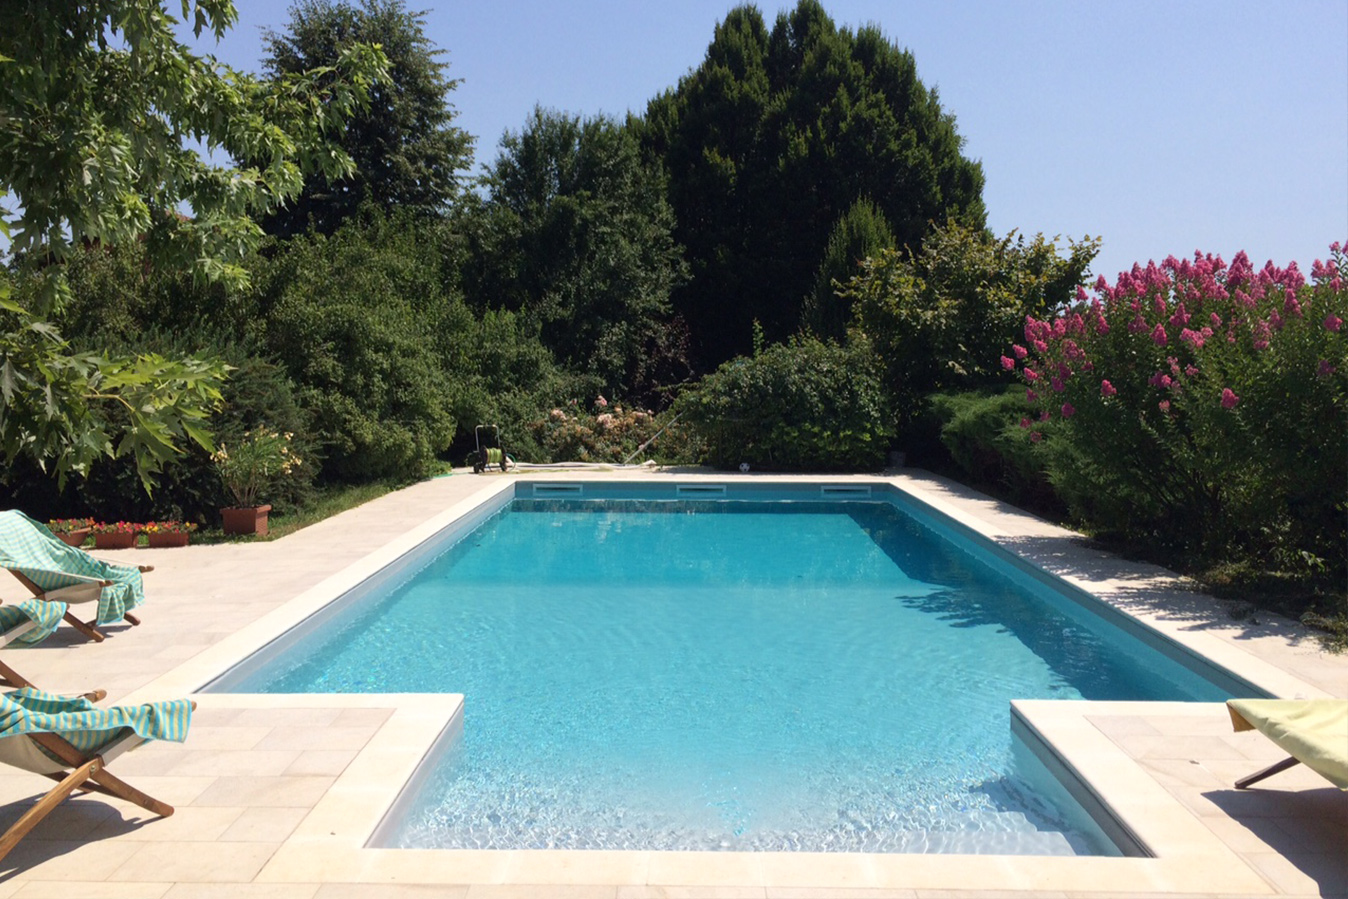 piscina interrata a skimmer con area solarium